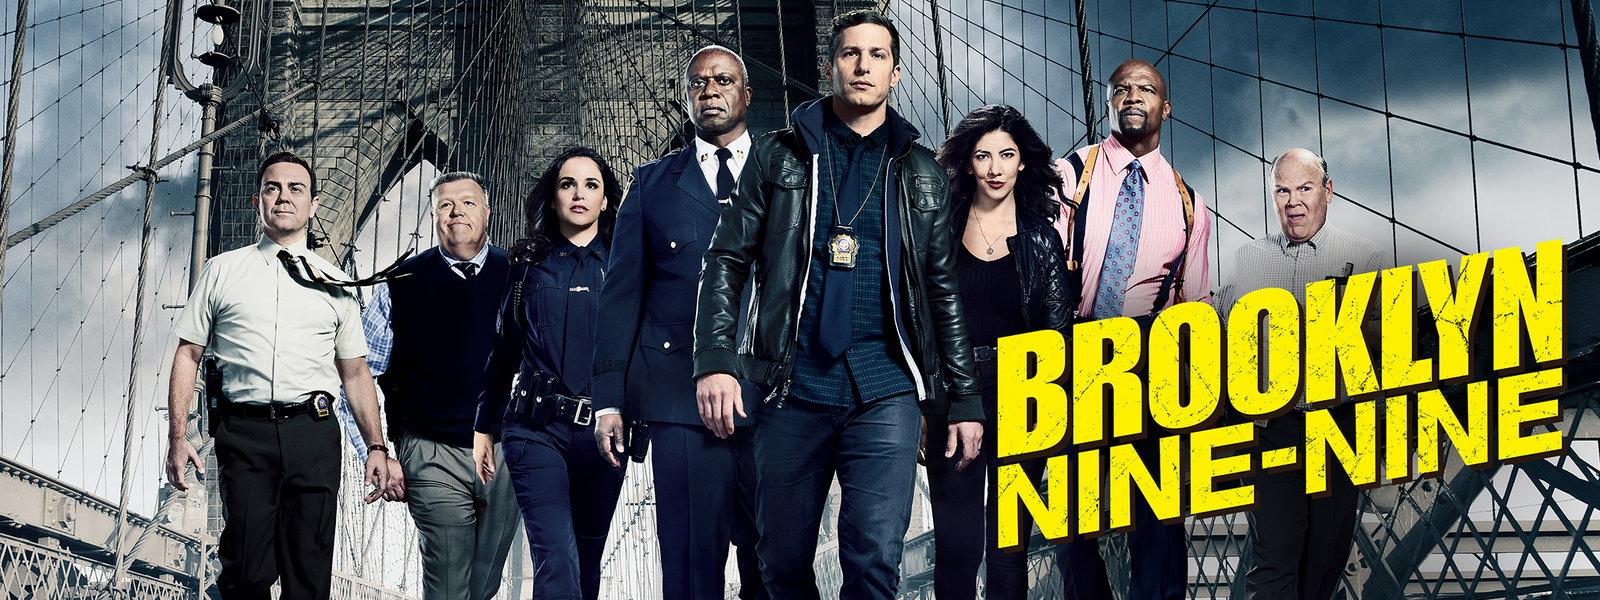 Brooklyn Nine-Nine (FOX) 15137?size=1600x600&region=US